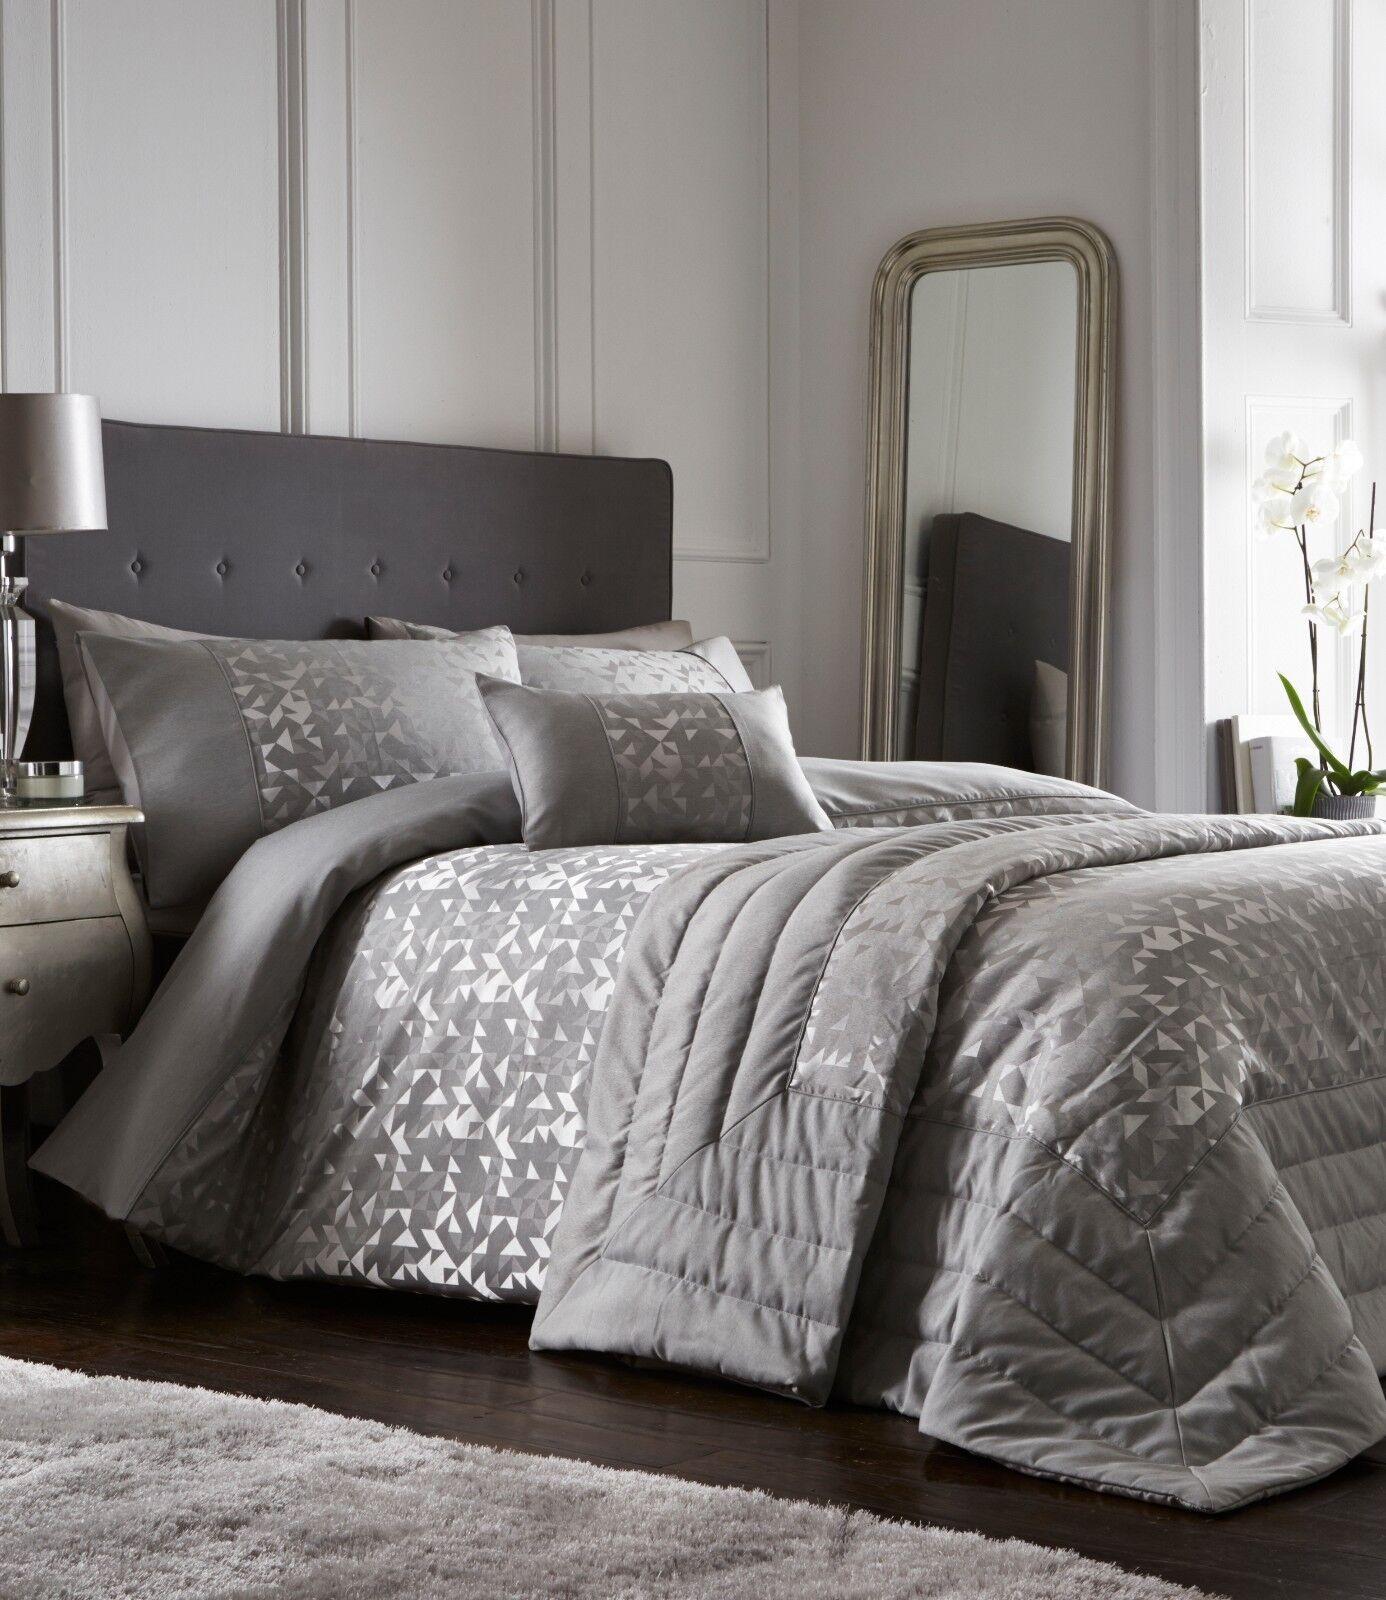 MINERAL Geometric Modern Jacquard Duvet Cover//Quilt Cover Set Bedding Range Grey